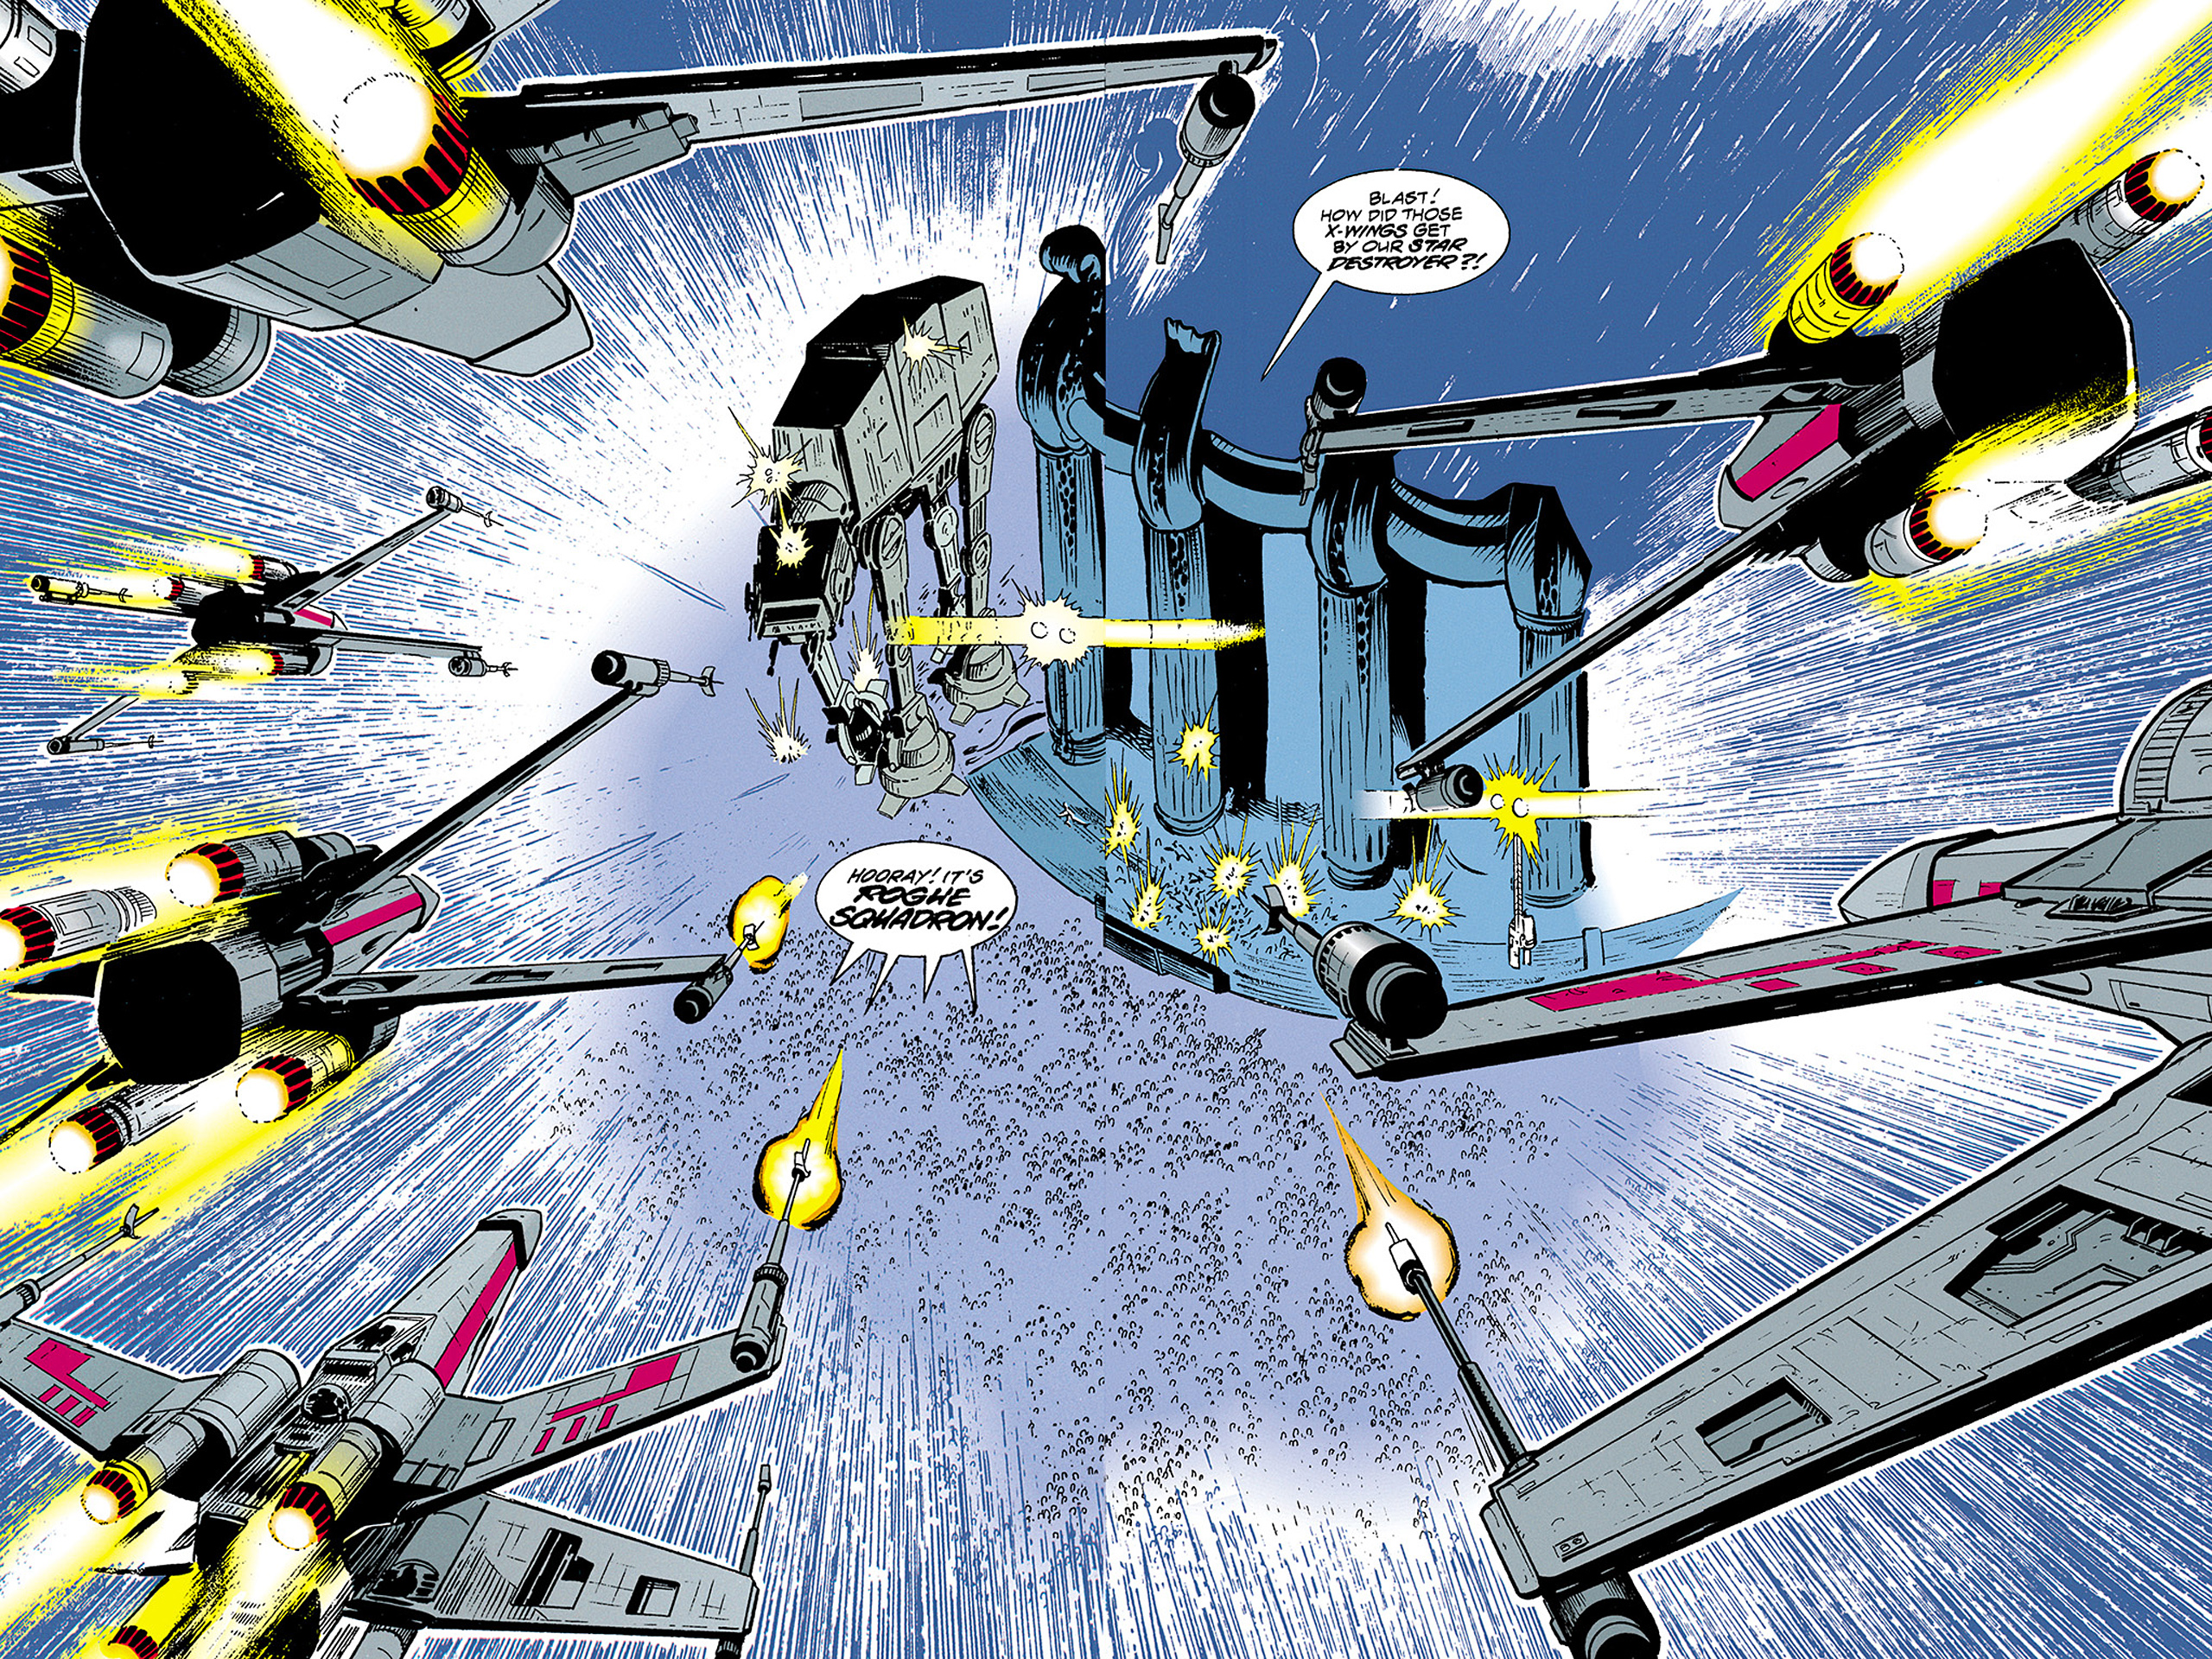 Battle of Tandankin (Galactic Civil War)